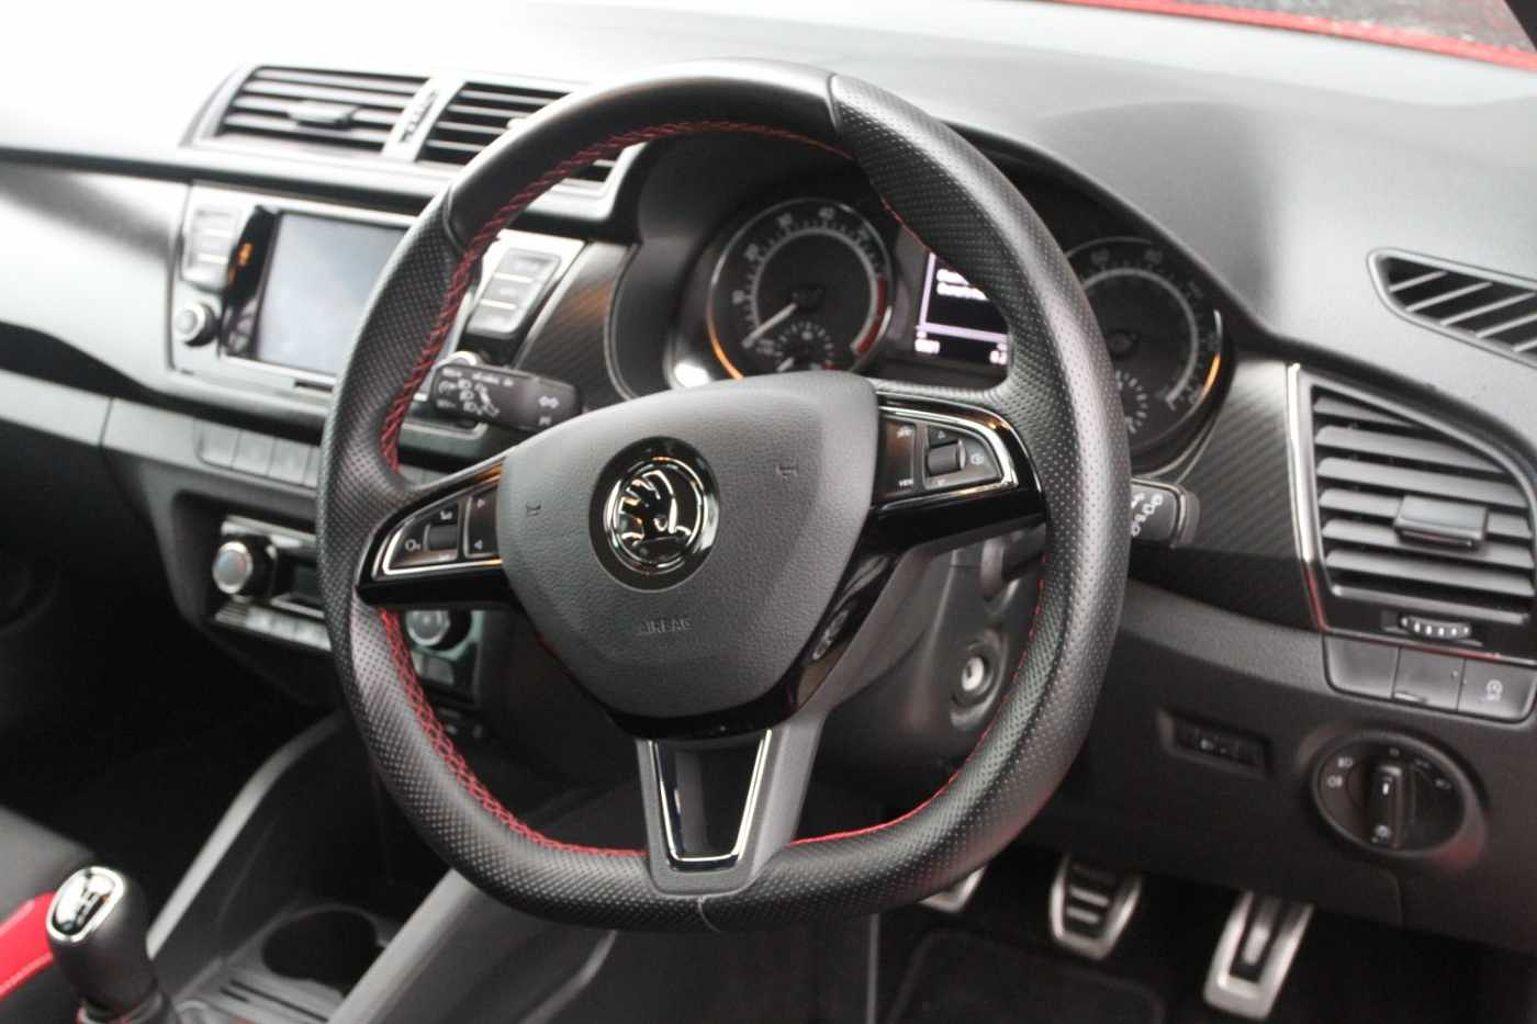 Skoda Fabia 1 0 Tsi Monte Carlo 110ps Ss 5dr Hatchback